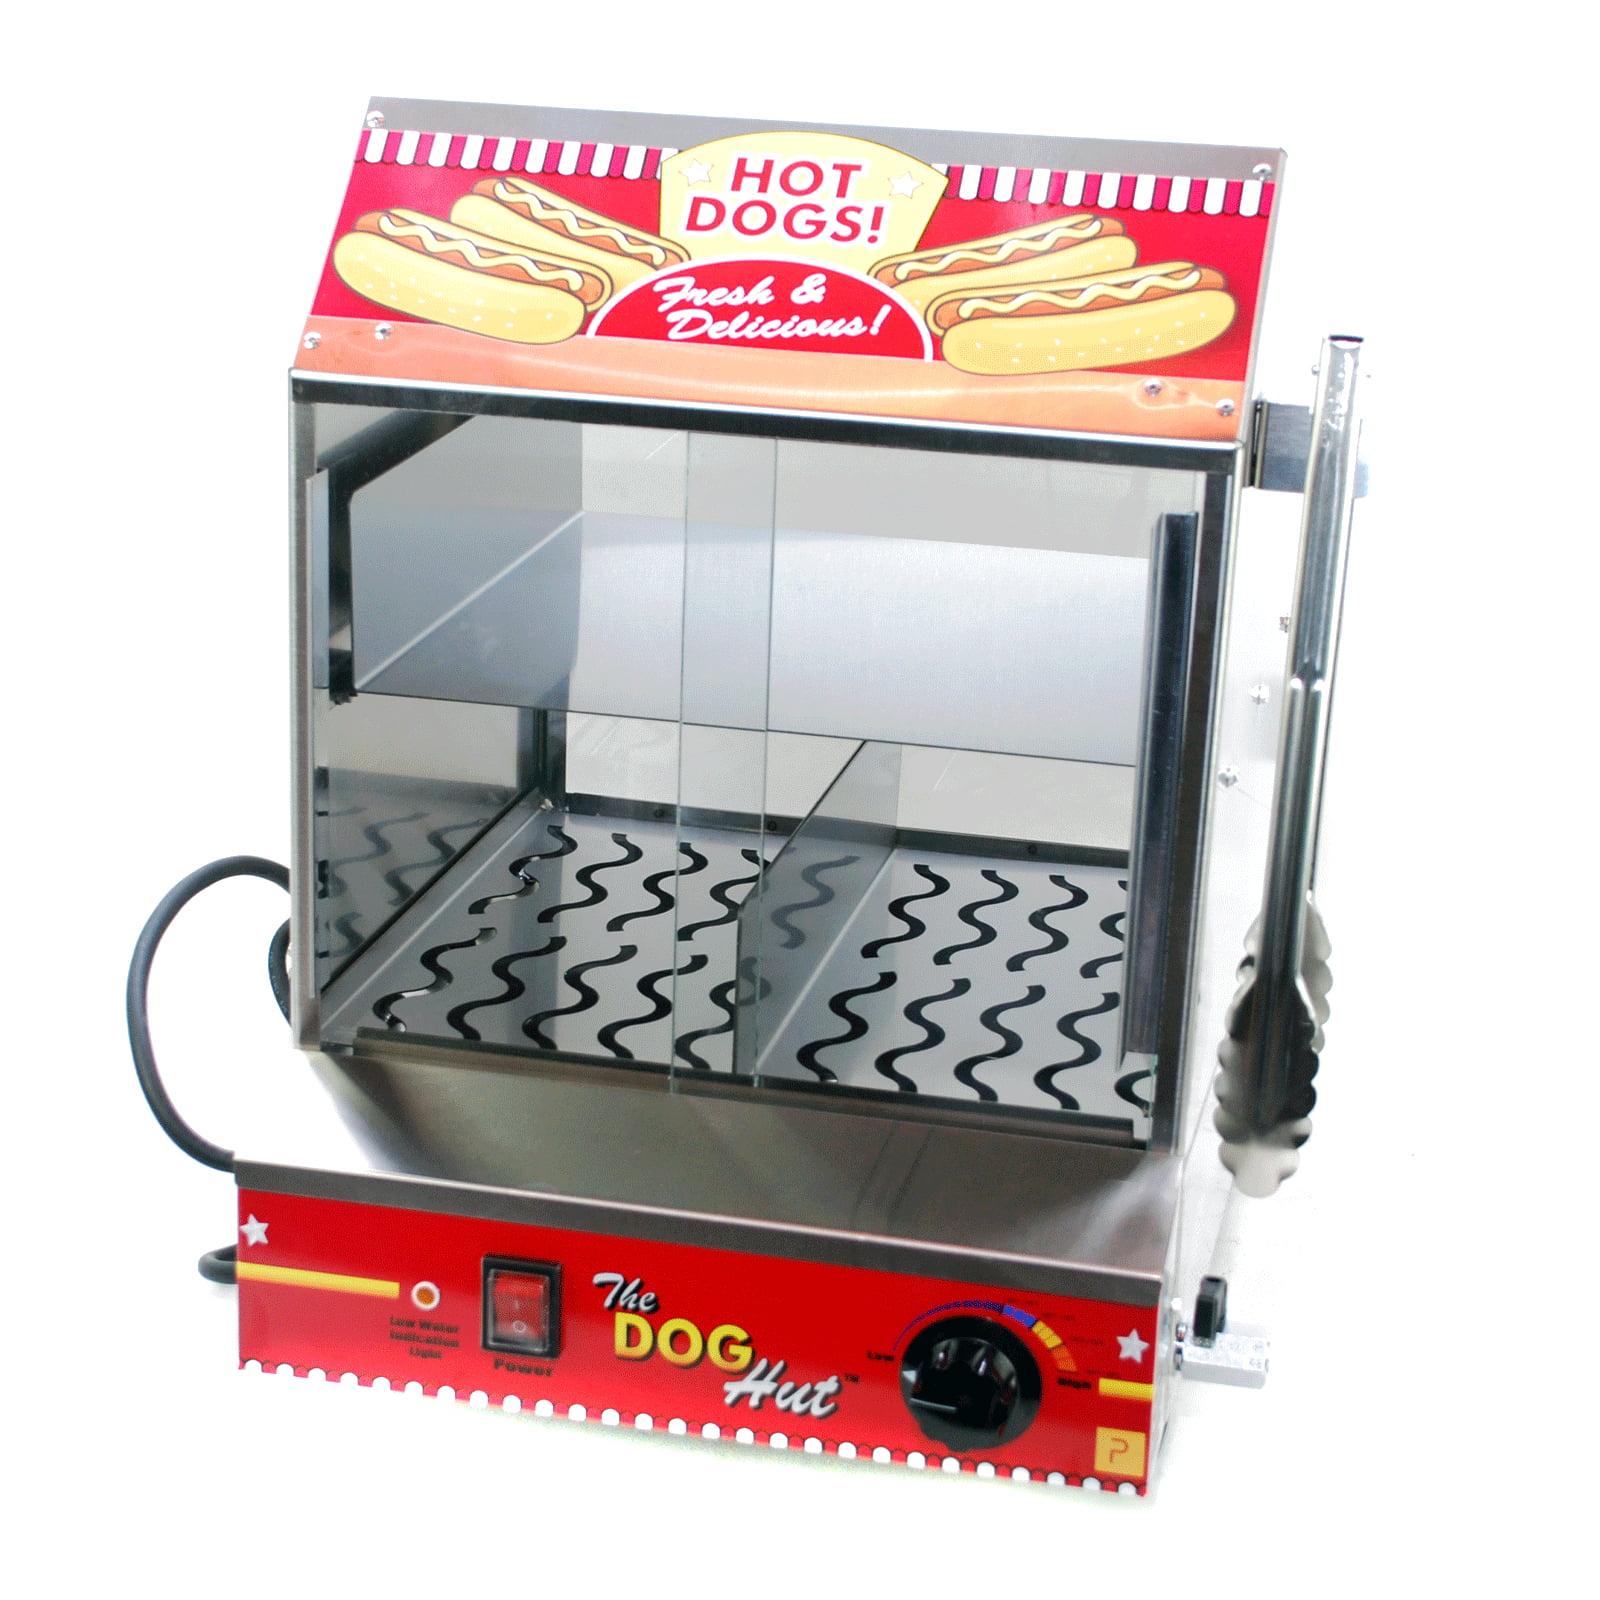 Paragon The Dog Hut Hotdog Sausage Steamer (Non-US 220V 50Hz) 8220